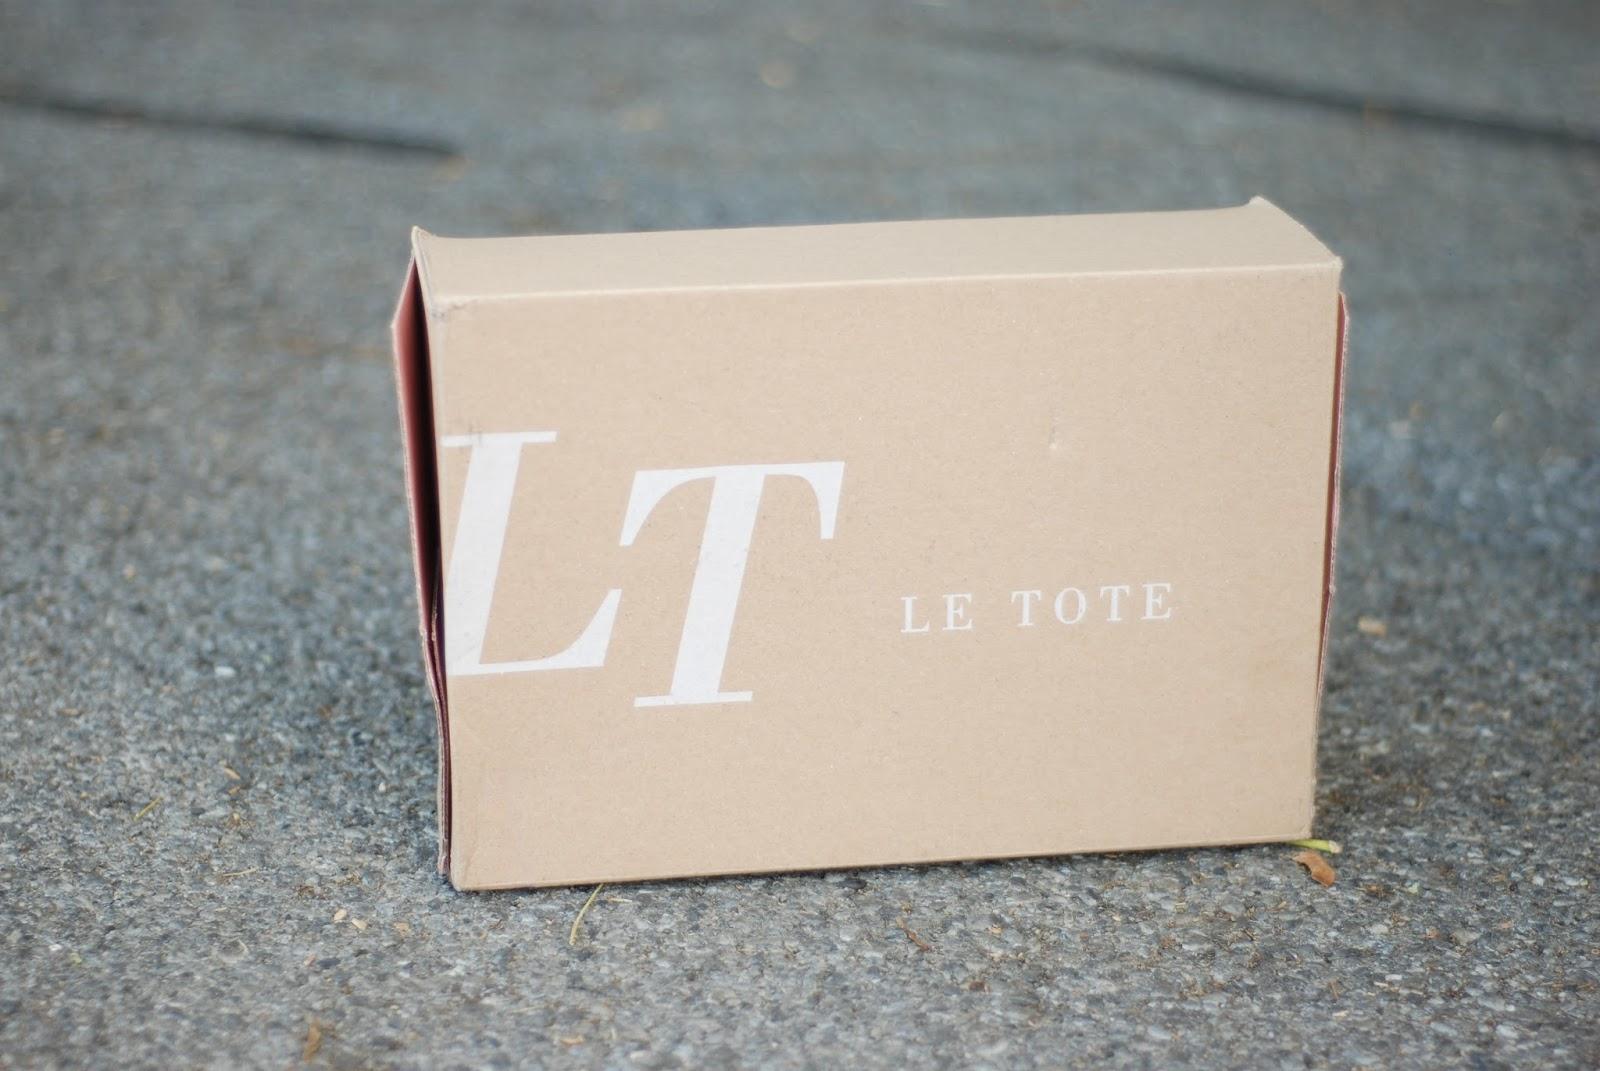 Le Tote, Le Tote Box